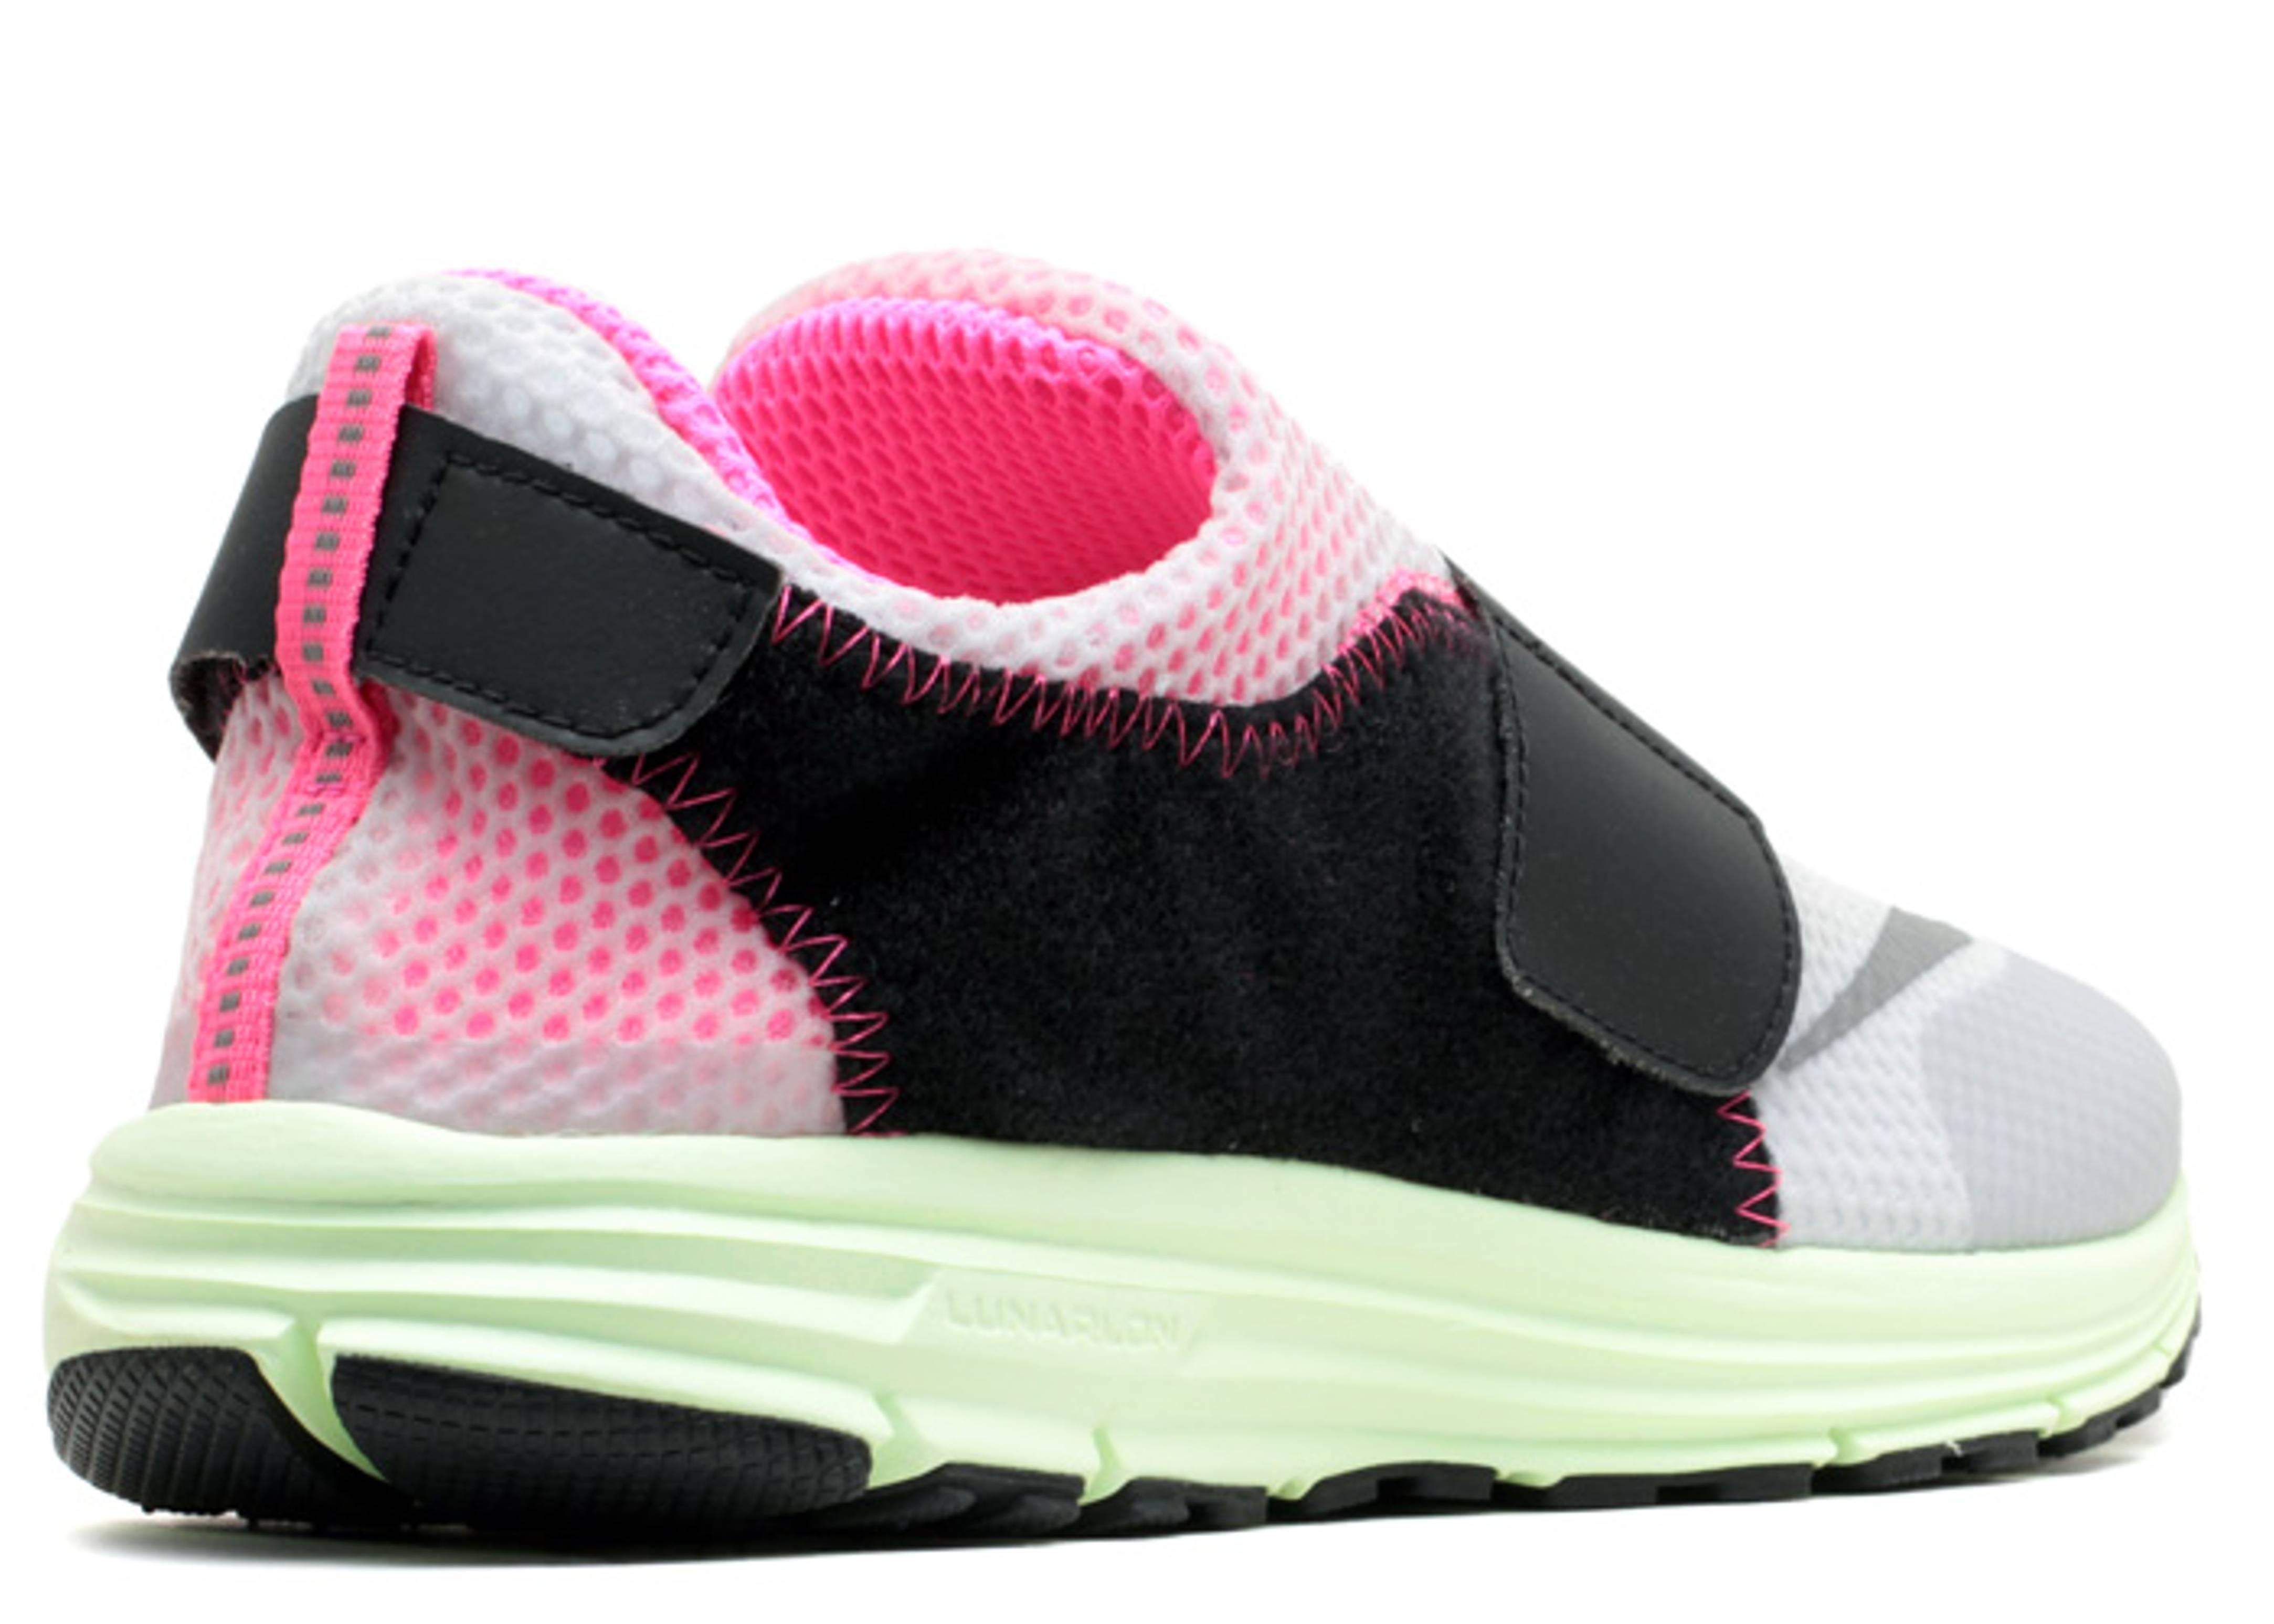 7a755582fdd63 Nike Lunarfly 306 China